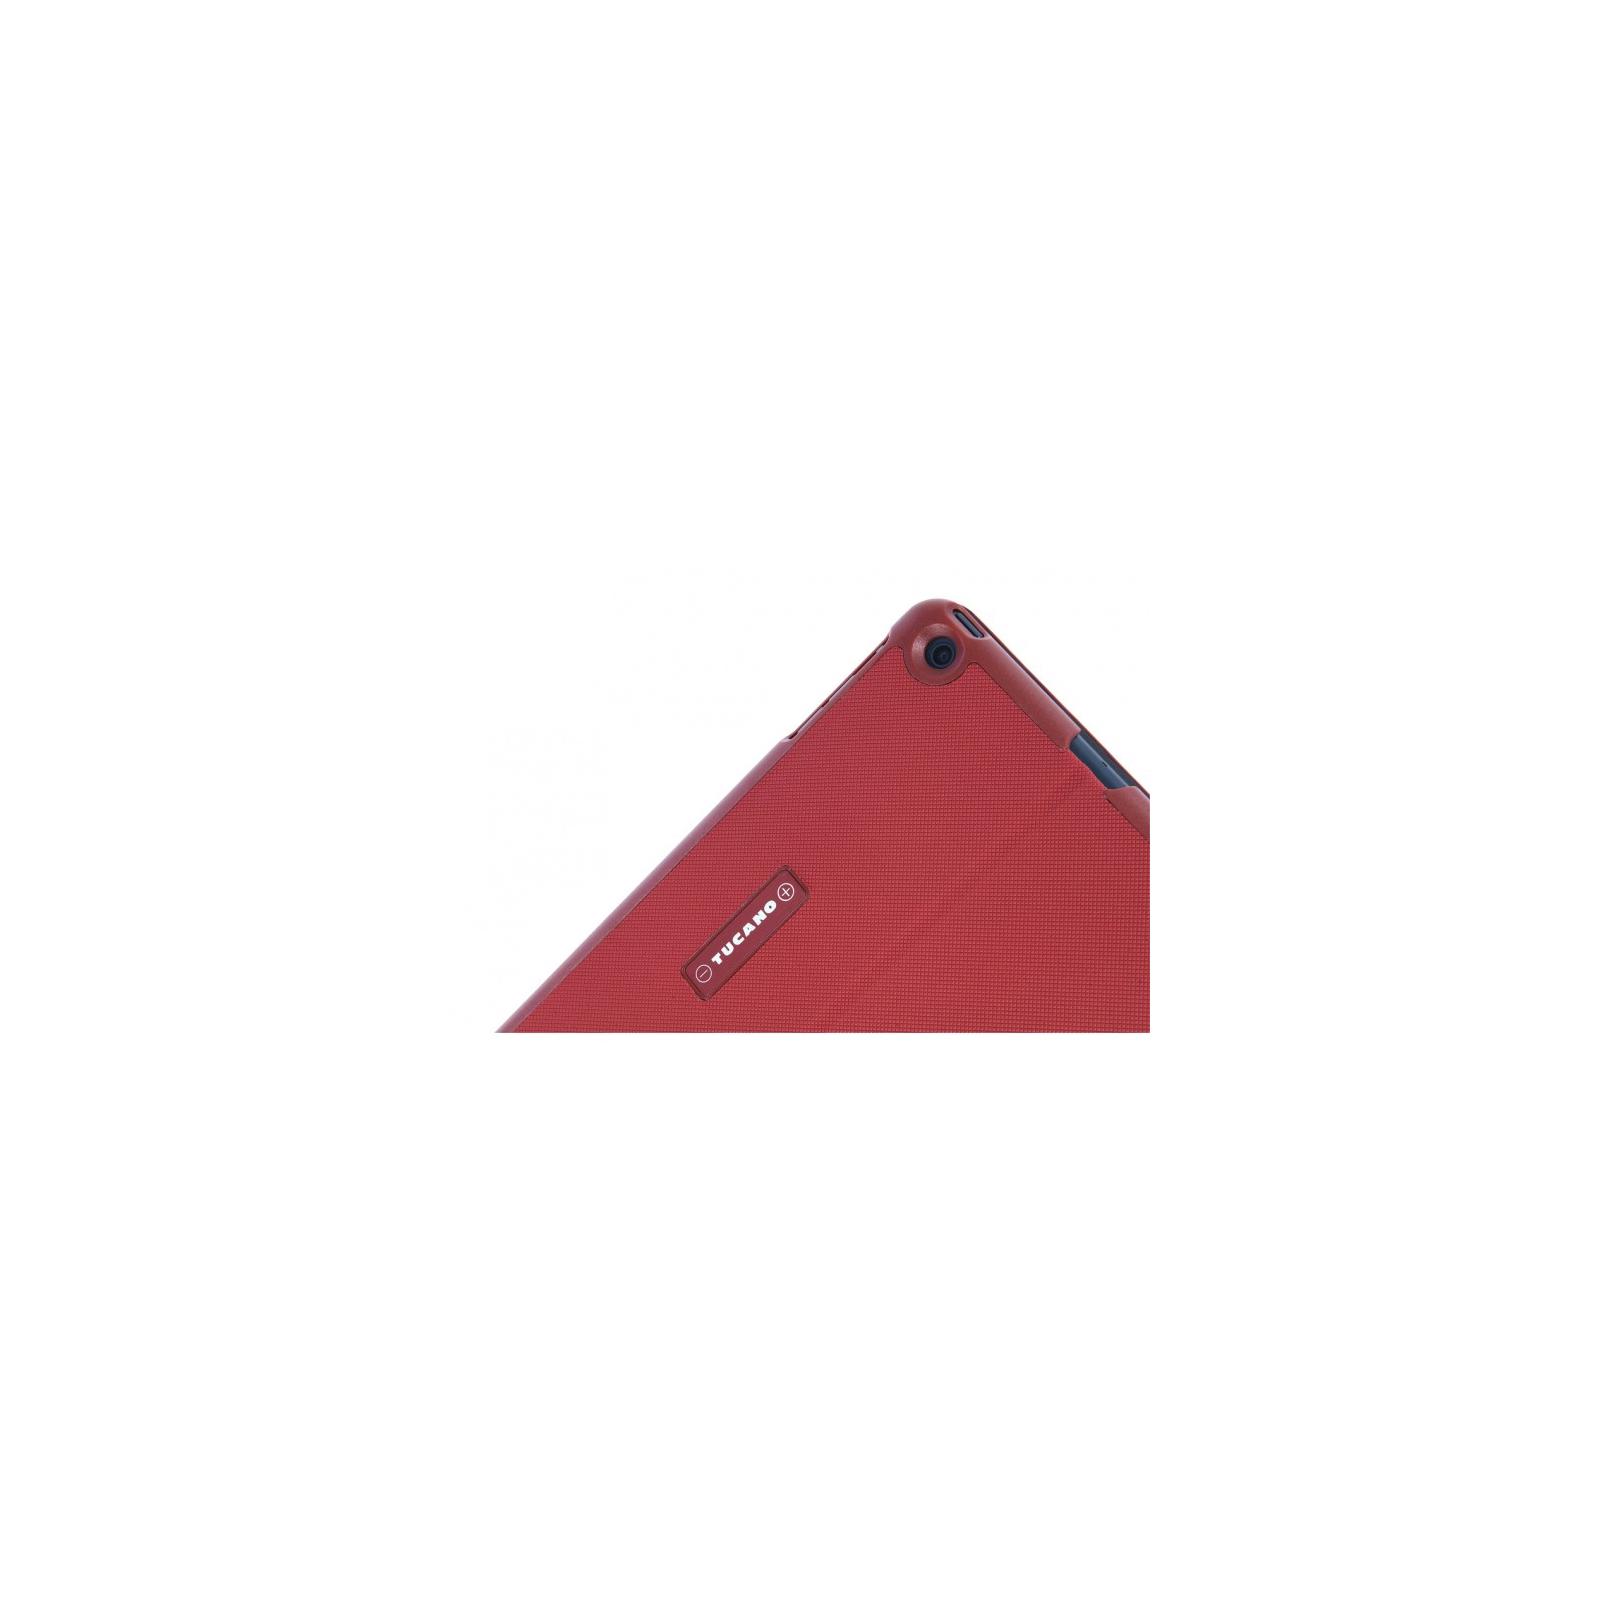 Чехол для планшета Tucano iPad Air Palmo Red (IPD5PA-R) изображение 9